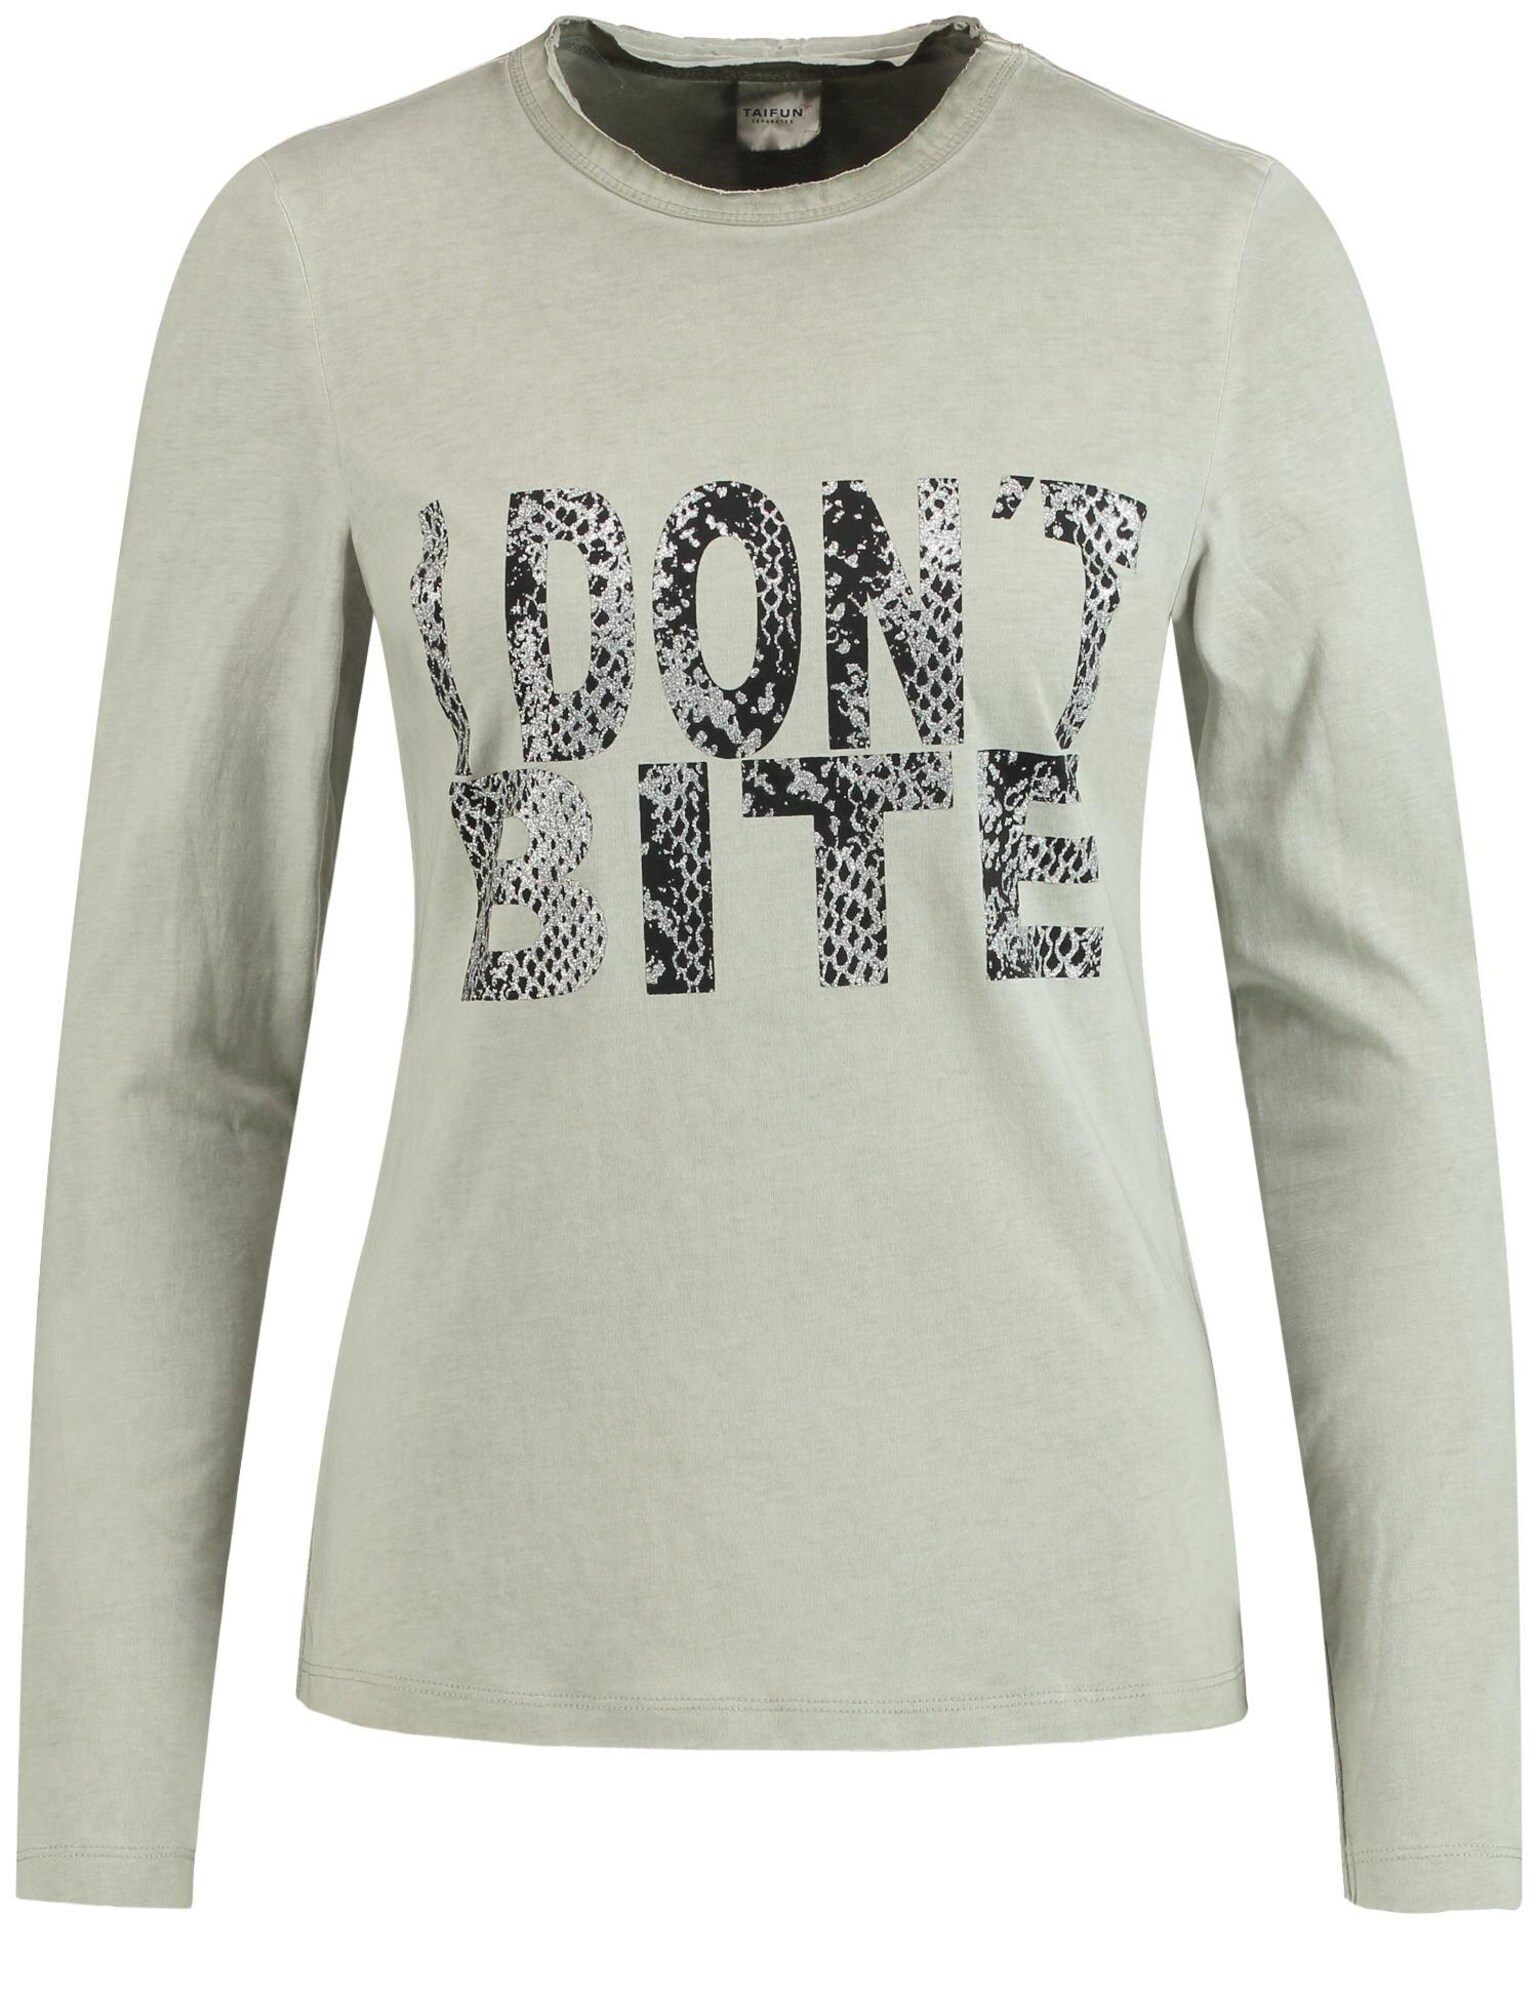 T-Shirt | Bekleidung > Shirts > Sonstige Shirts | Khaki - Schwarz - Silber | TAIFUN